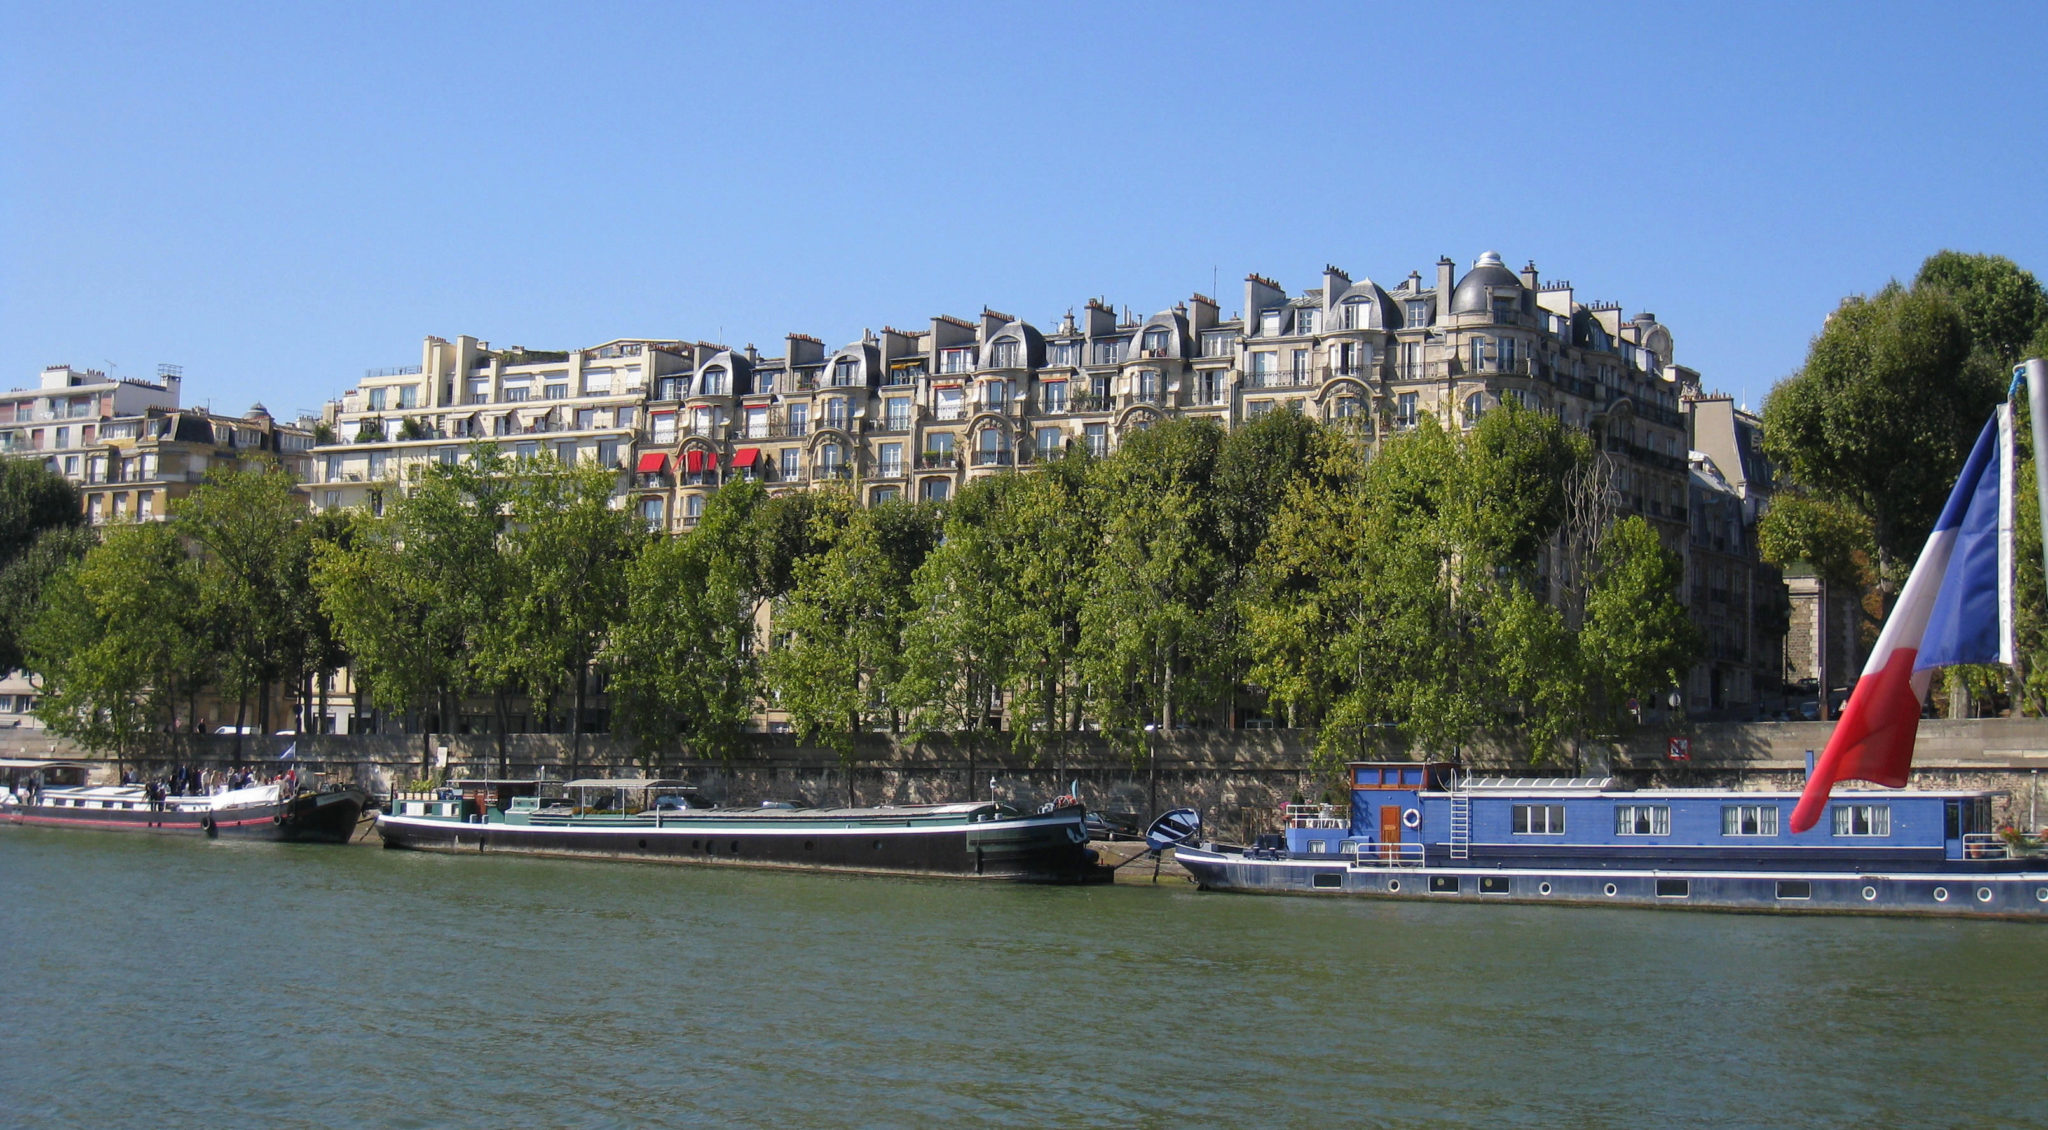 investir-a-rueil-malmaison-grand-paris-bertrand-demanes